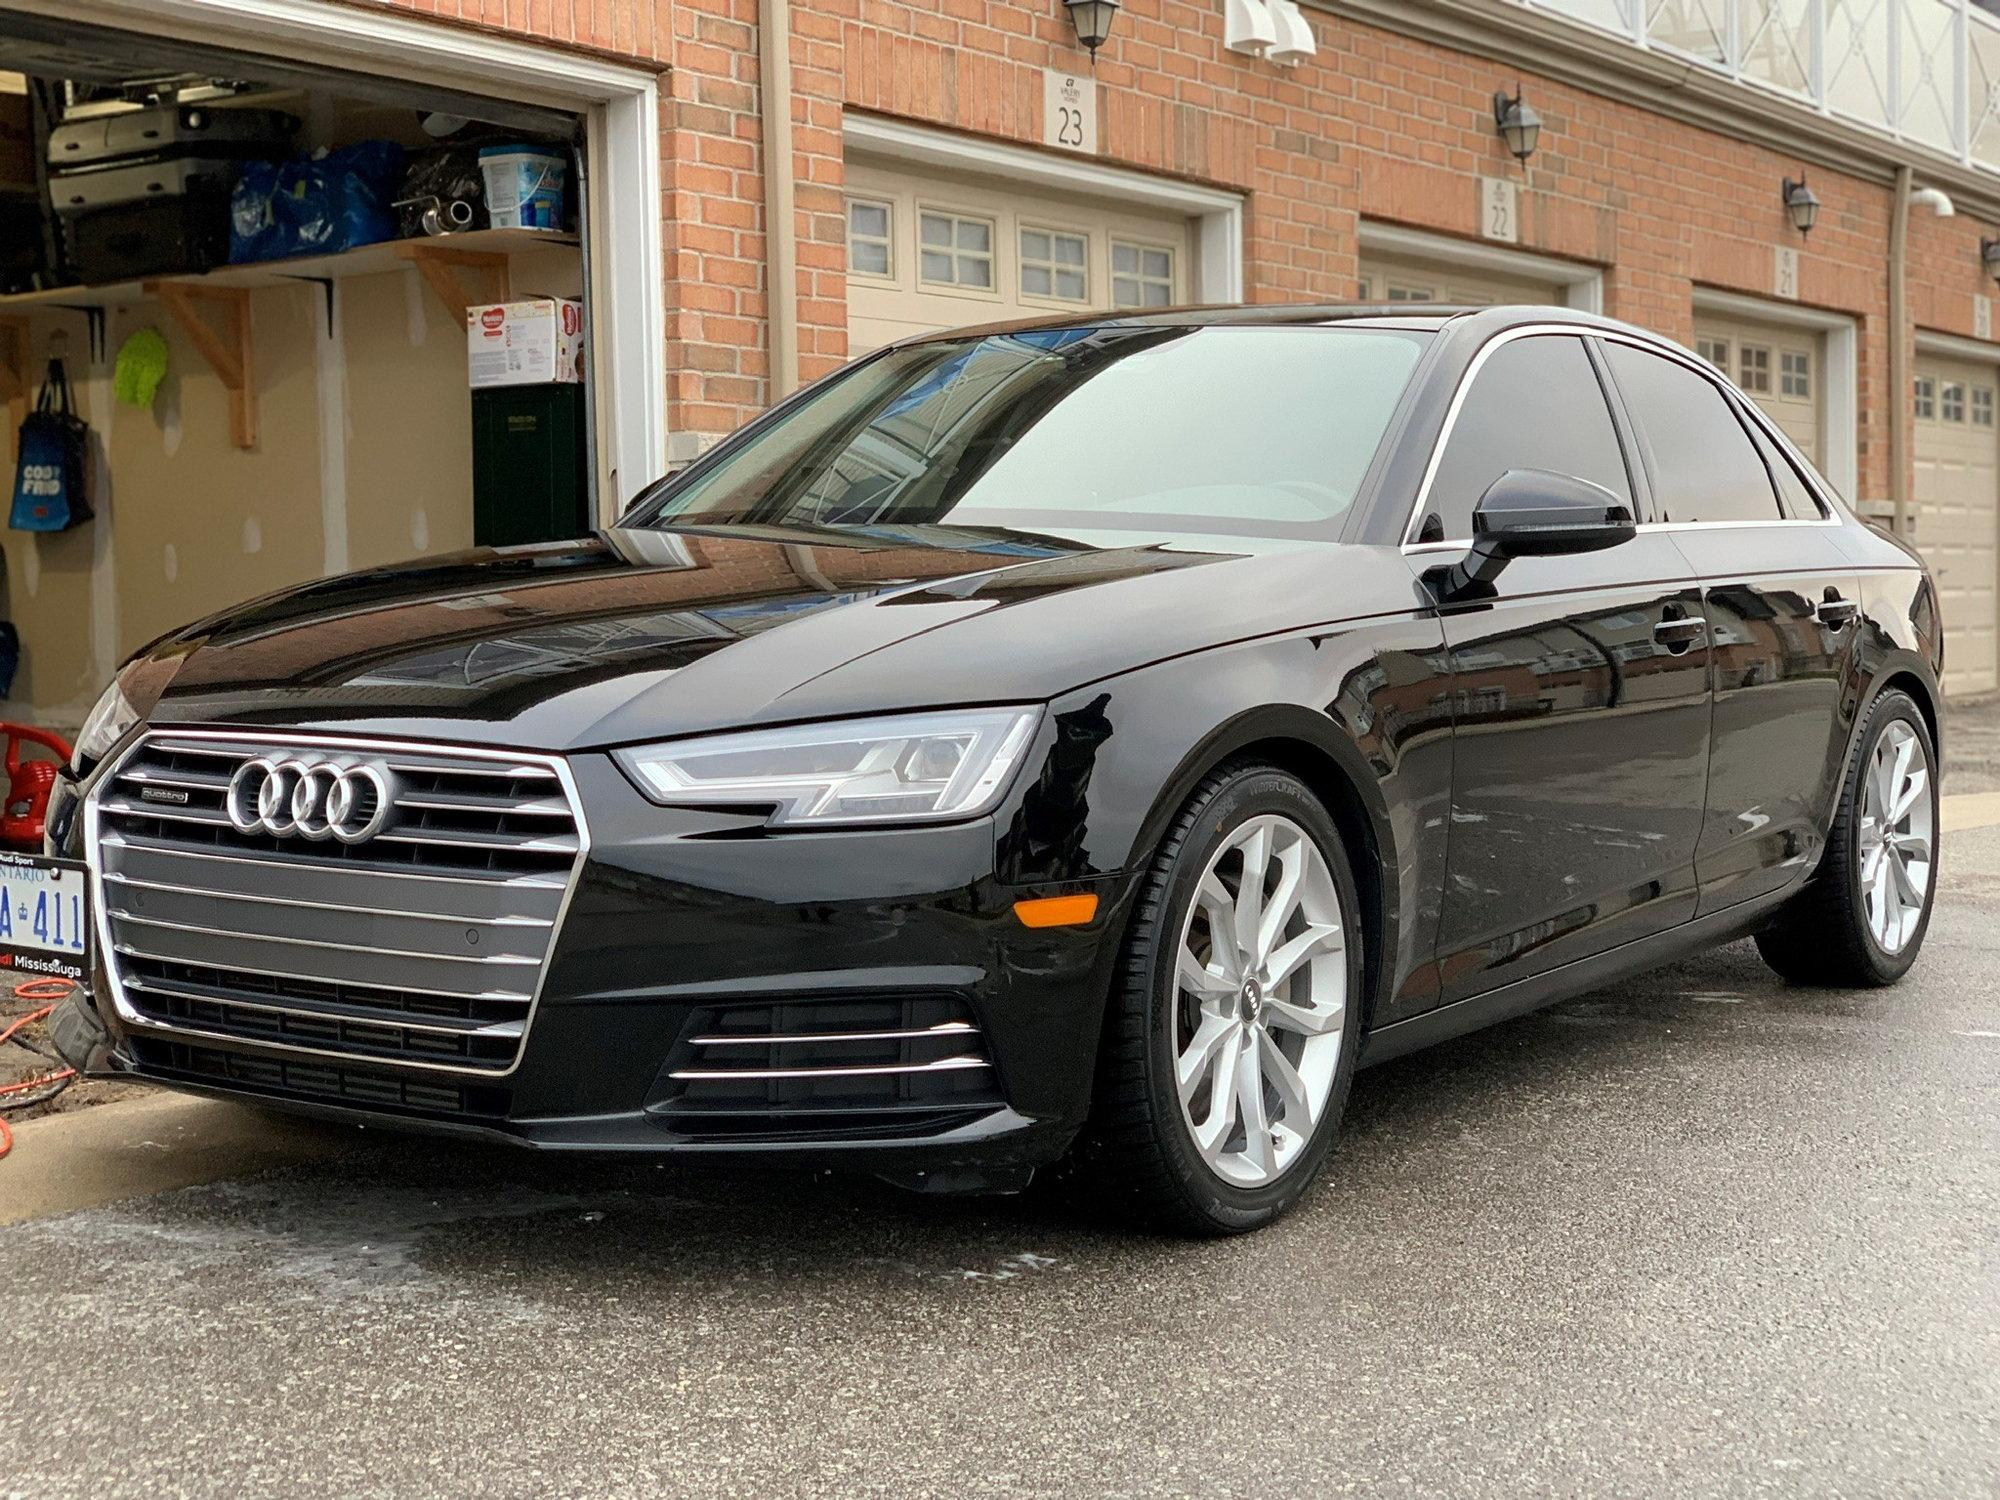 Kelebihan Audi 18 Review